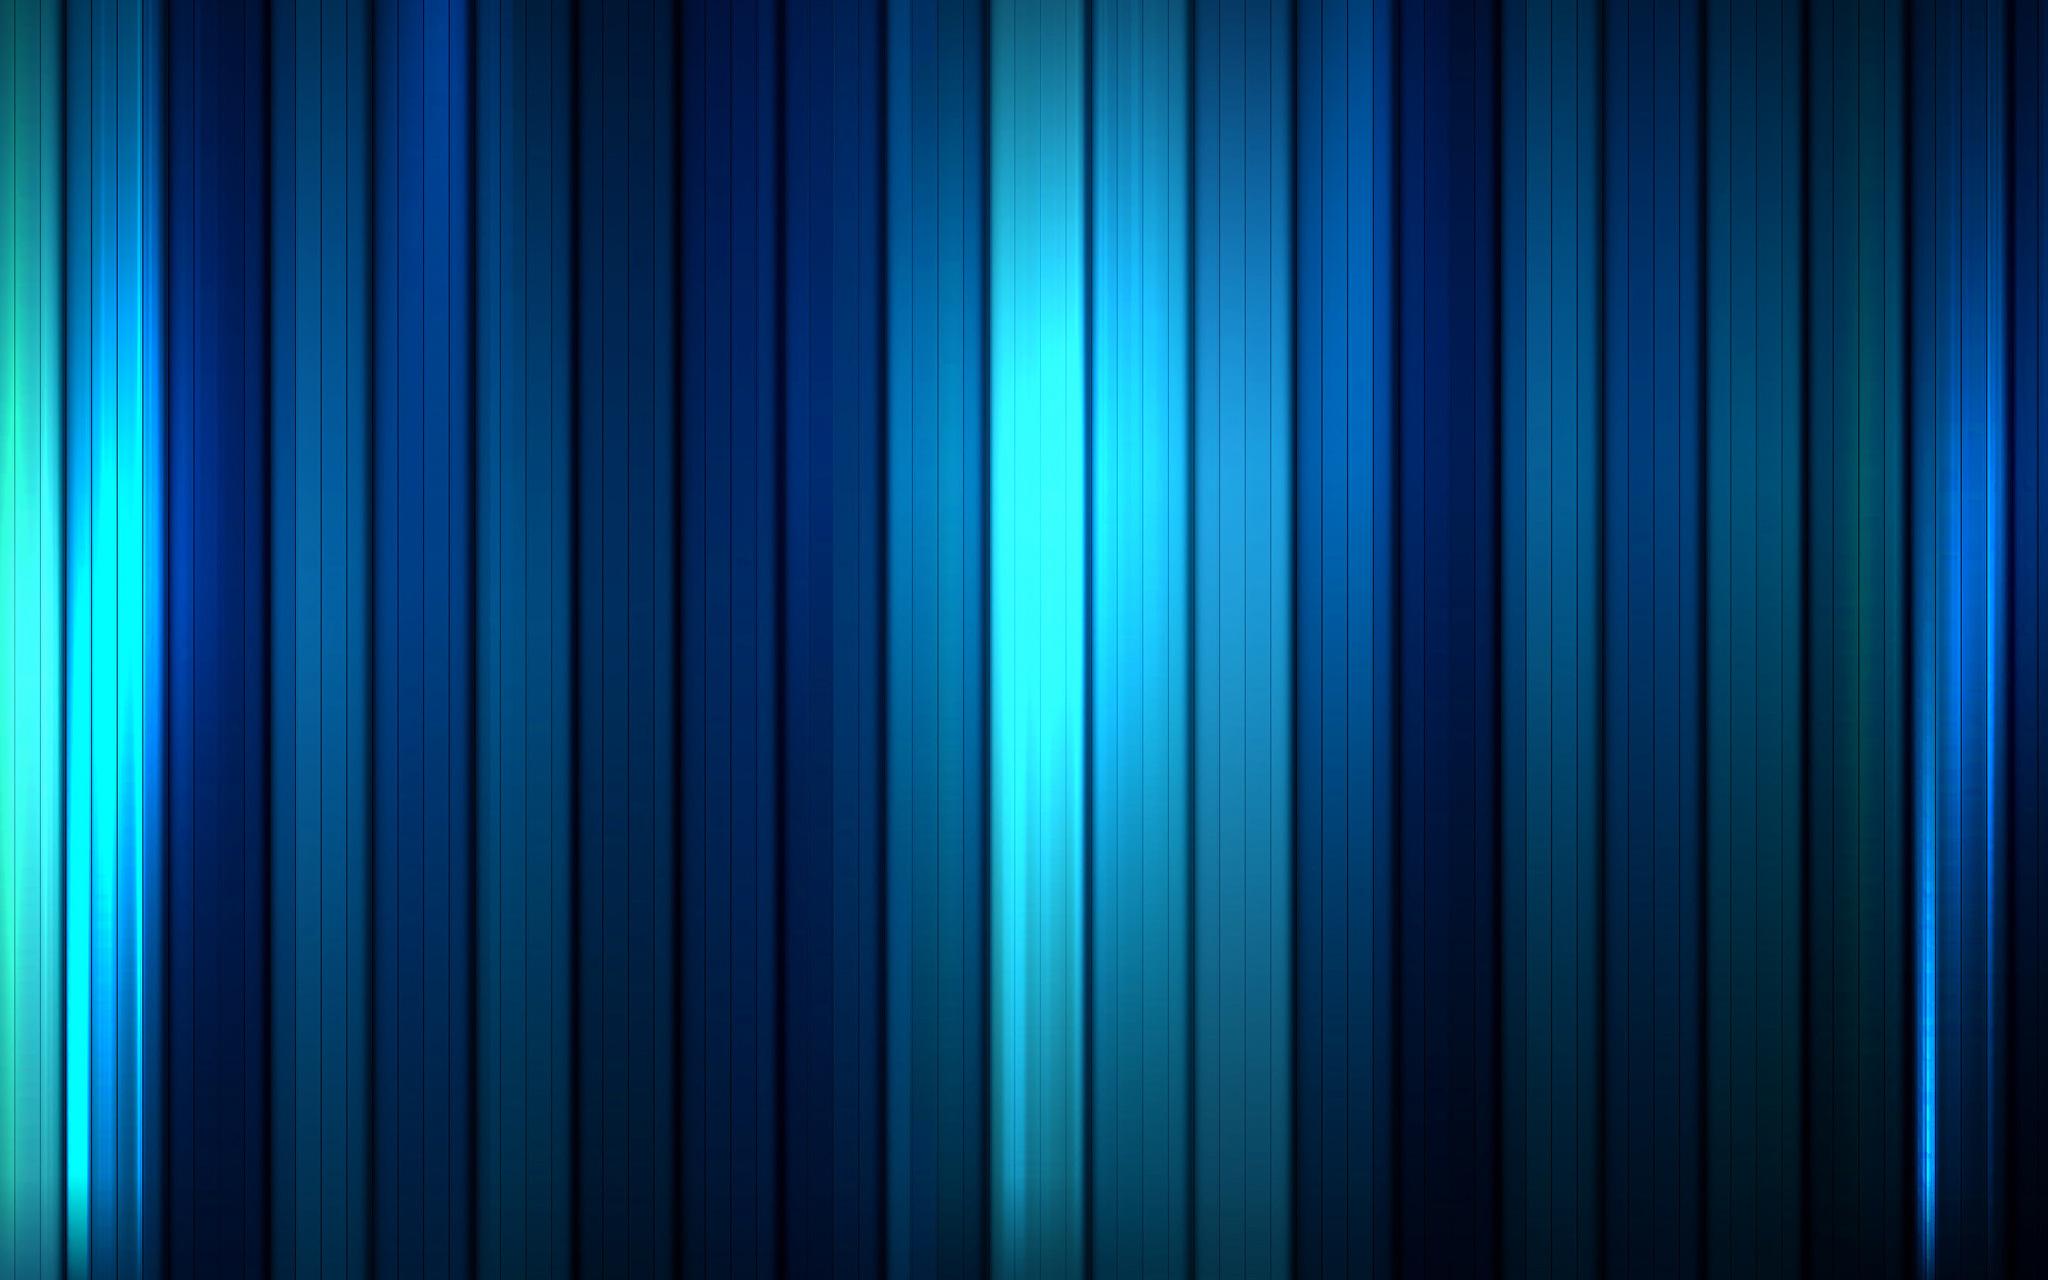 Blue Stripes Presentation Template for Keynote